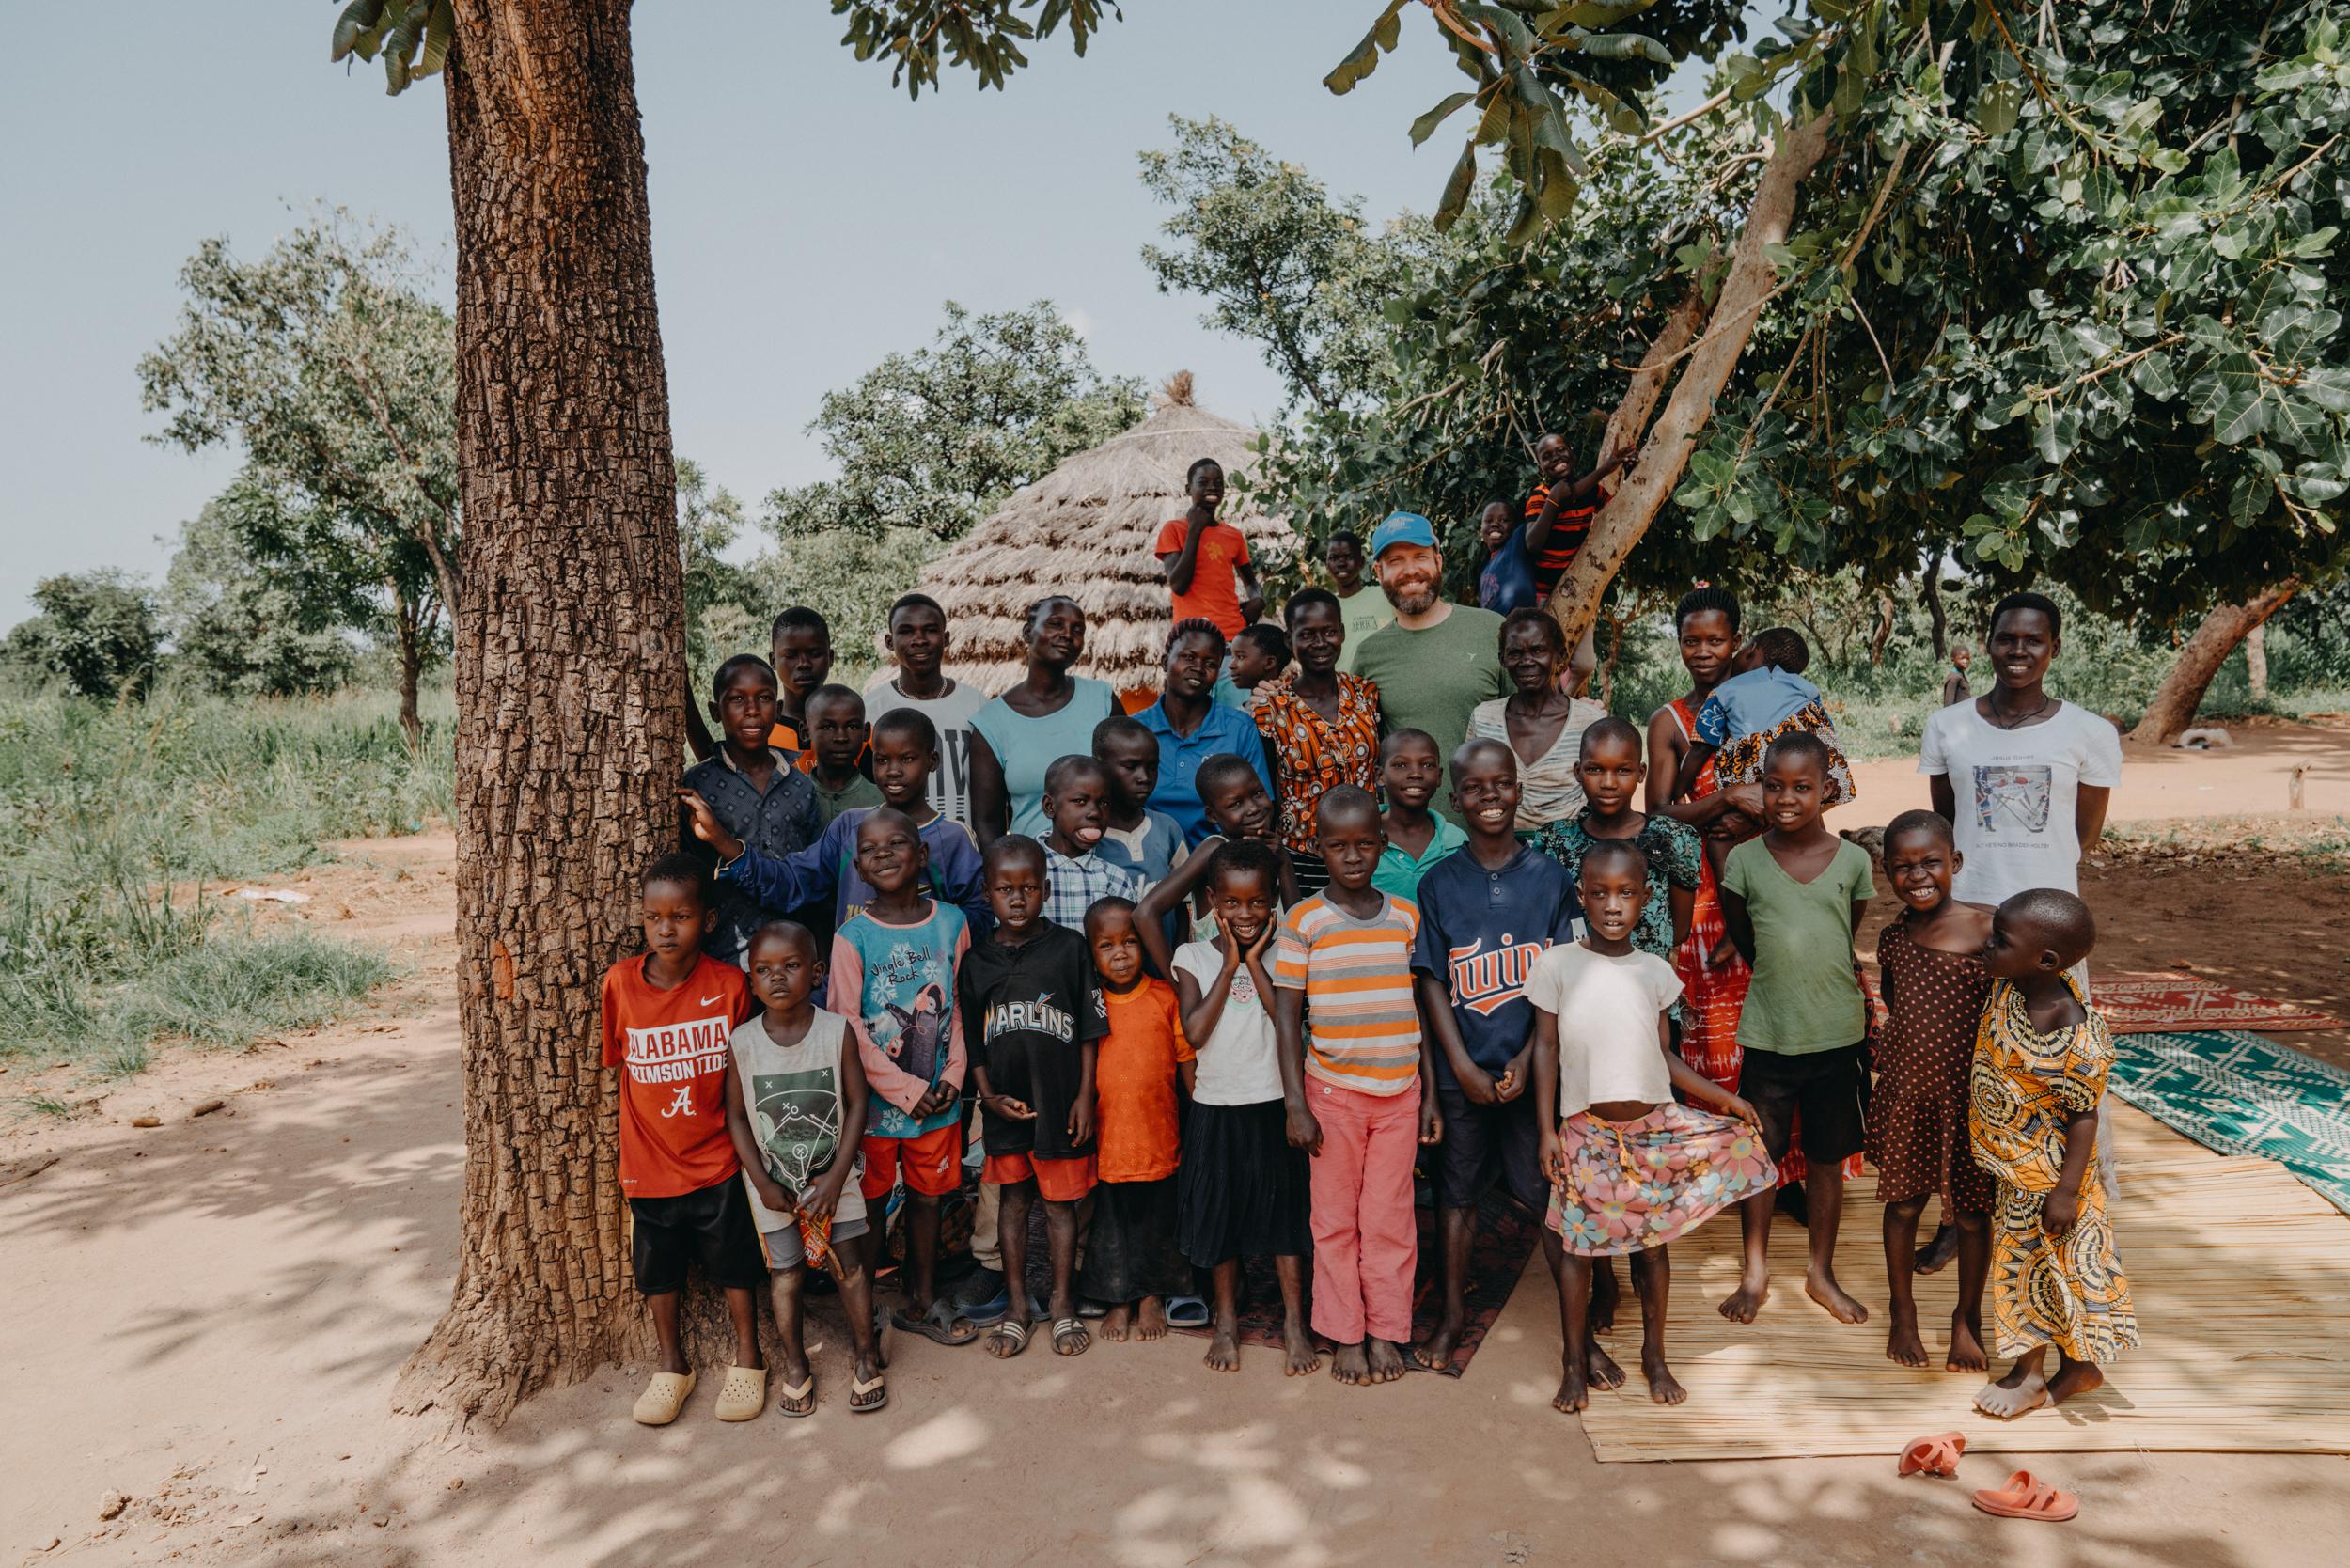 uganda july 2018-52.jpg